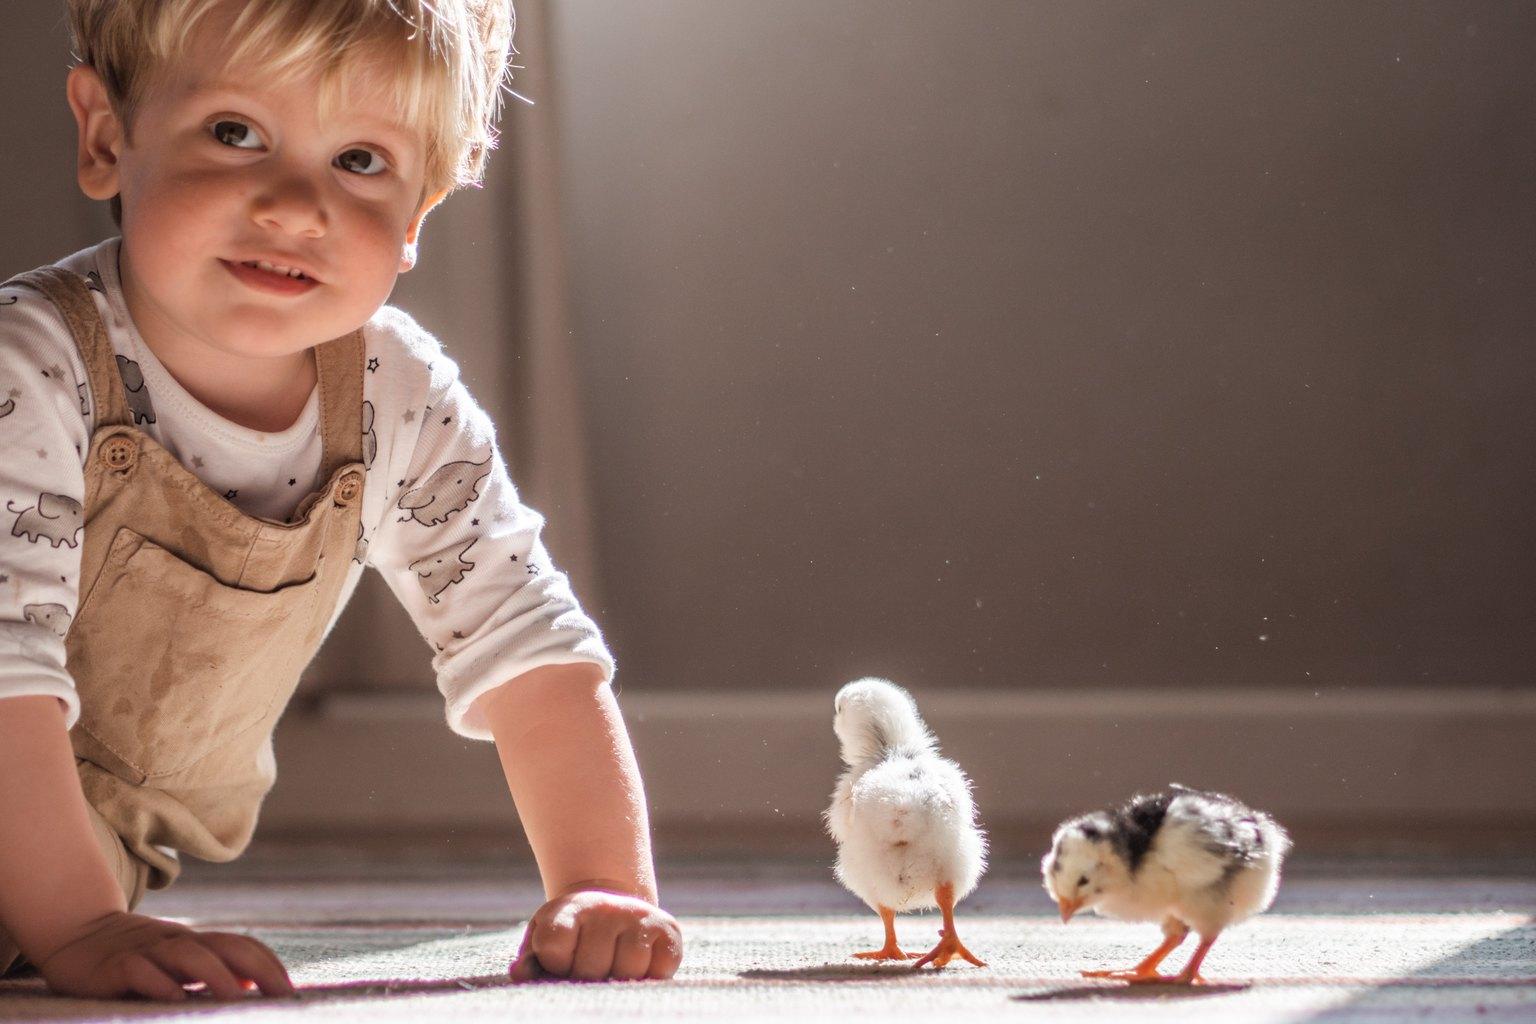 Fotografía de niño en casa con dos pollitos